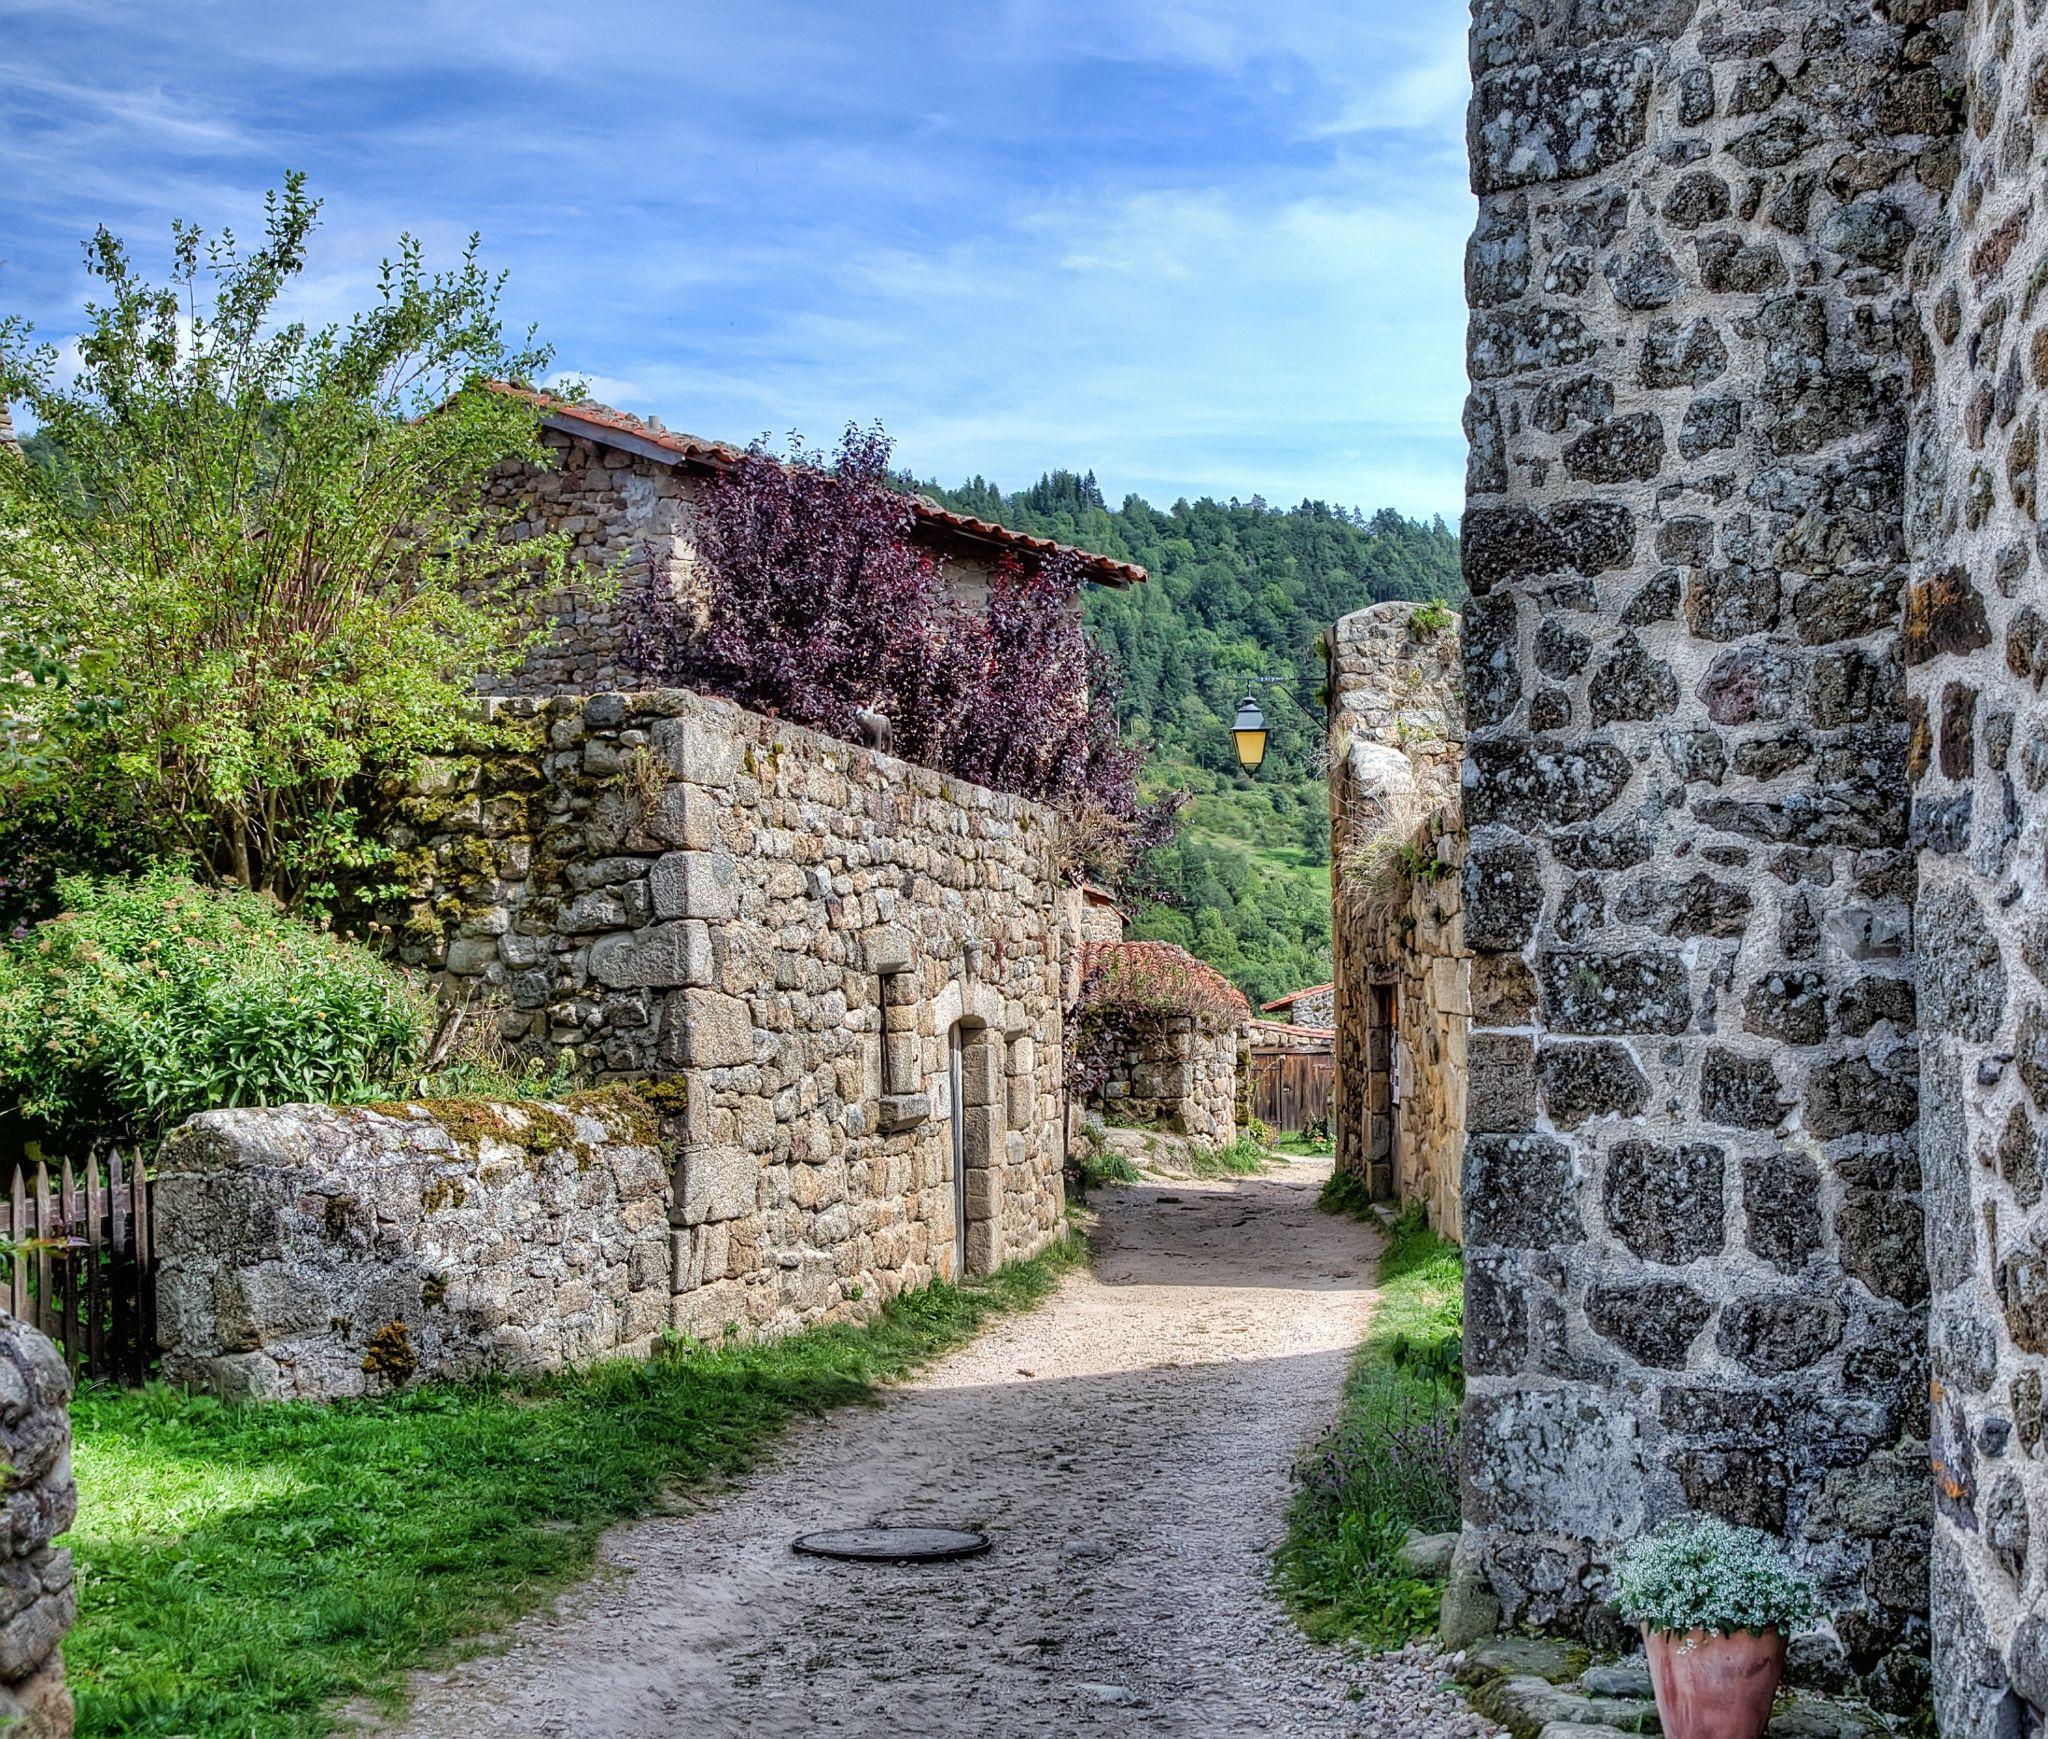 Chalencon, village médiéval by Guy Rougier on 500px